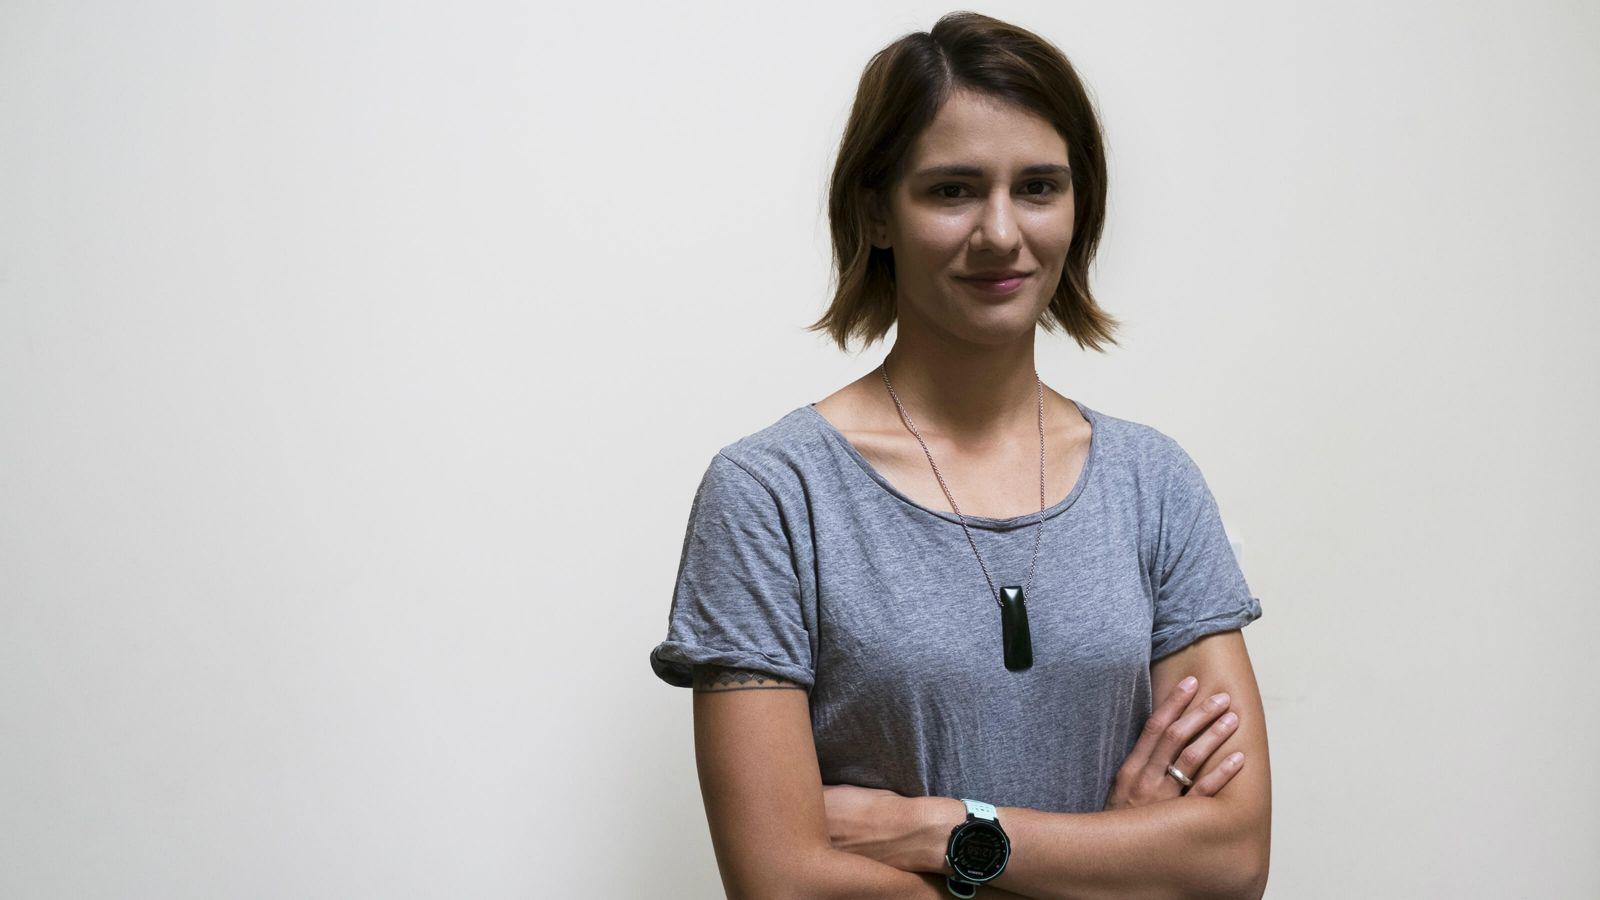 Human Resources PhD candidate Esme Franken